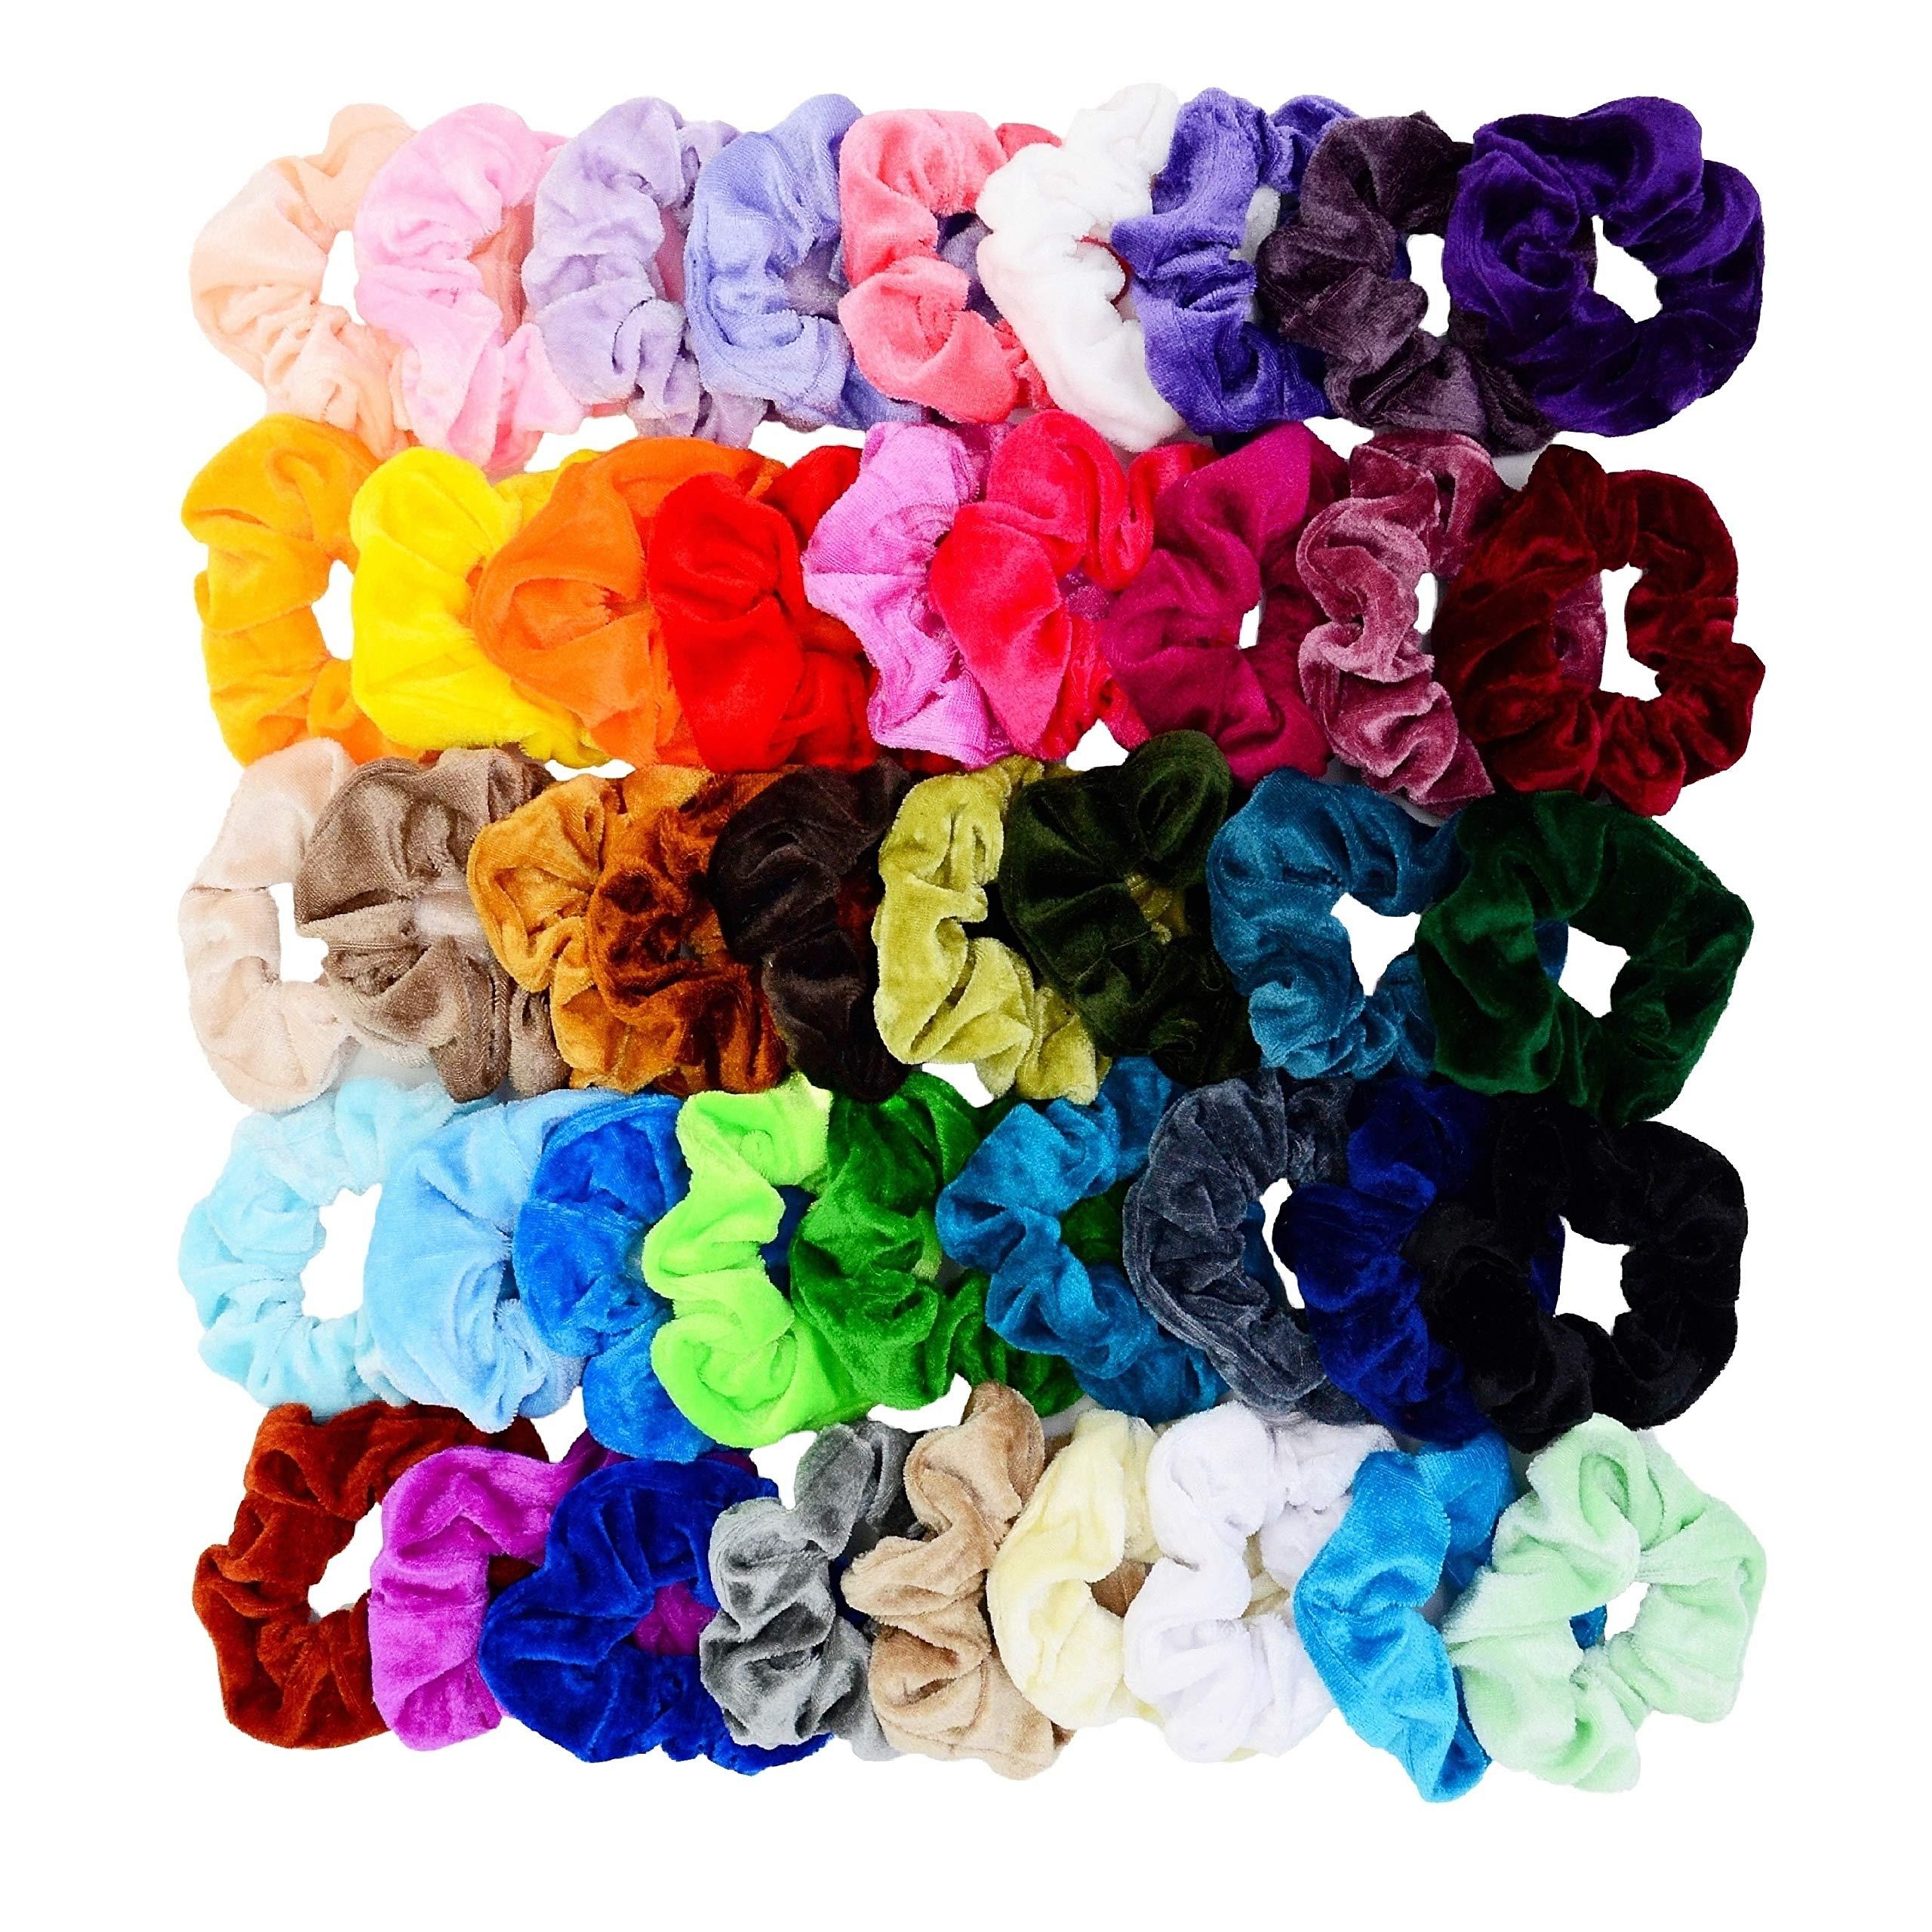 Chloven 45 Pcs Hair Scrunchies Velvet Elastics Bobbles Hair Bands Scrunchy Hair Tie Ropes Scrunchie for Women Girls Hair Accessories- 45 Assorted Colors Scrunchies by Chloven